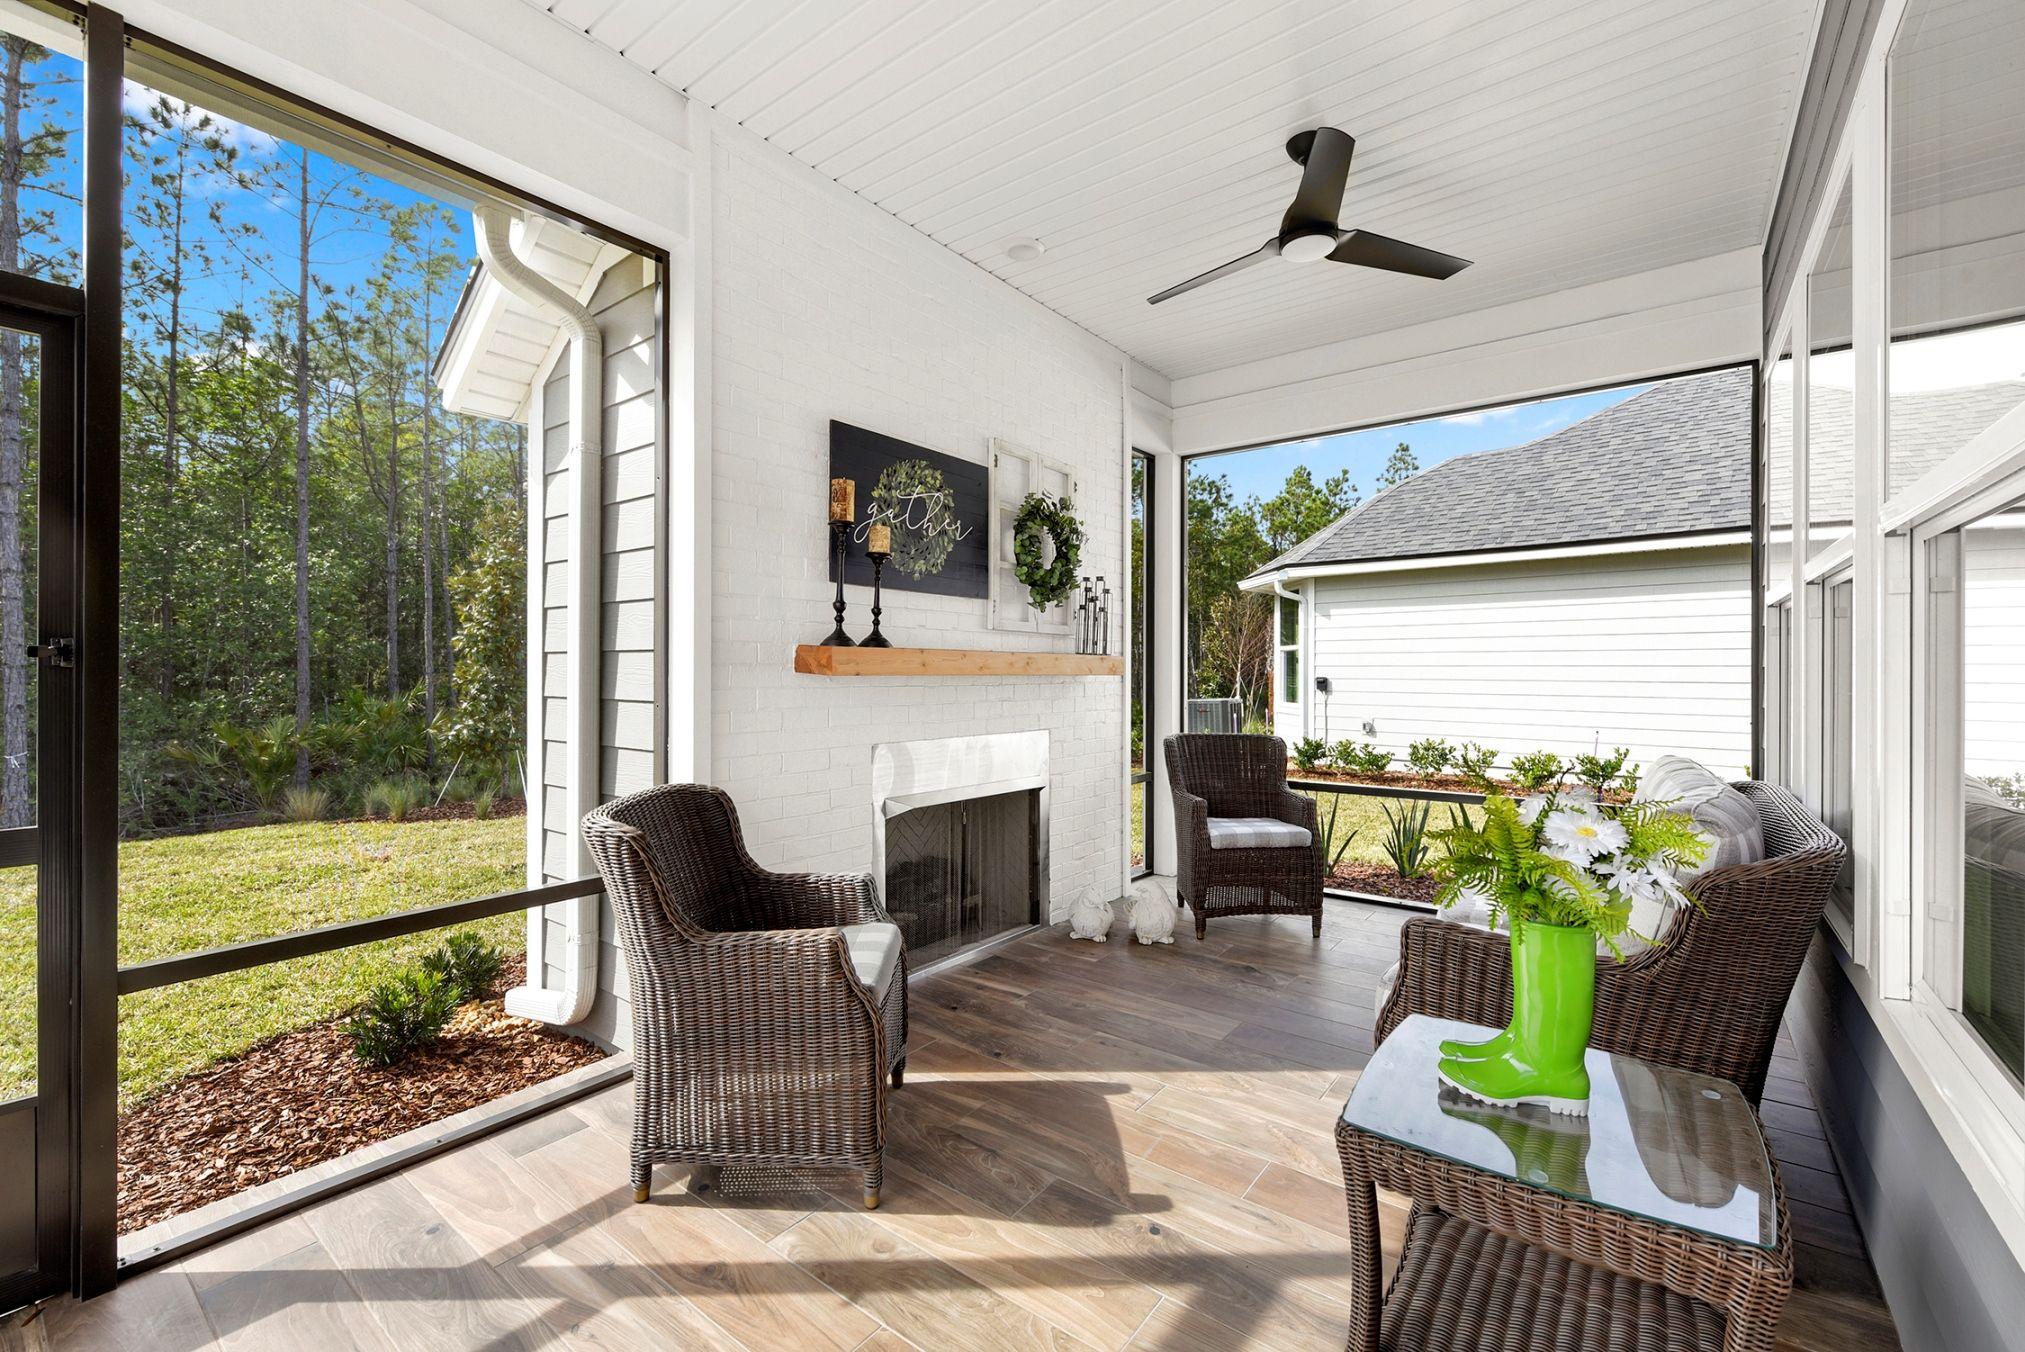 Outdoor Living in 2020 | Riverside house, Model homes ... on Riverside Outdoor Living id=81489